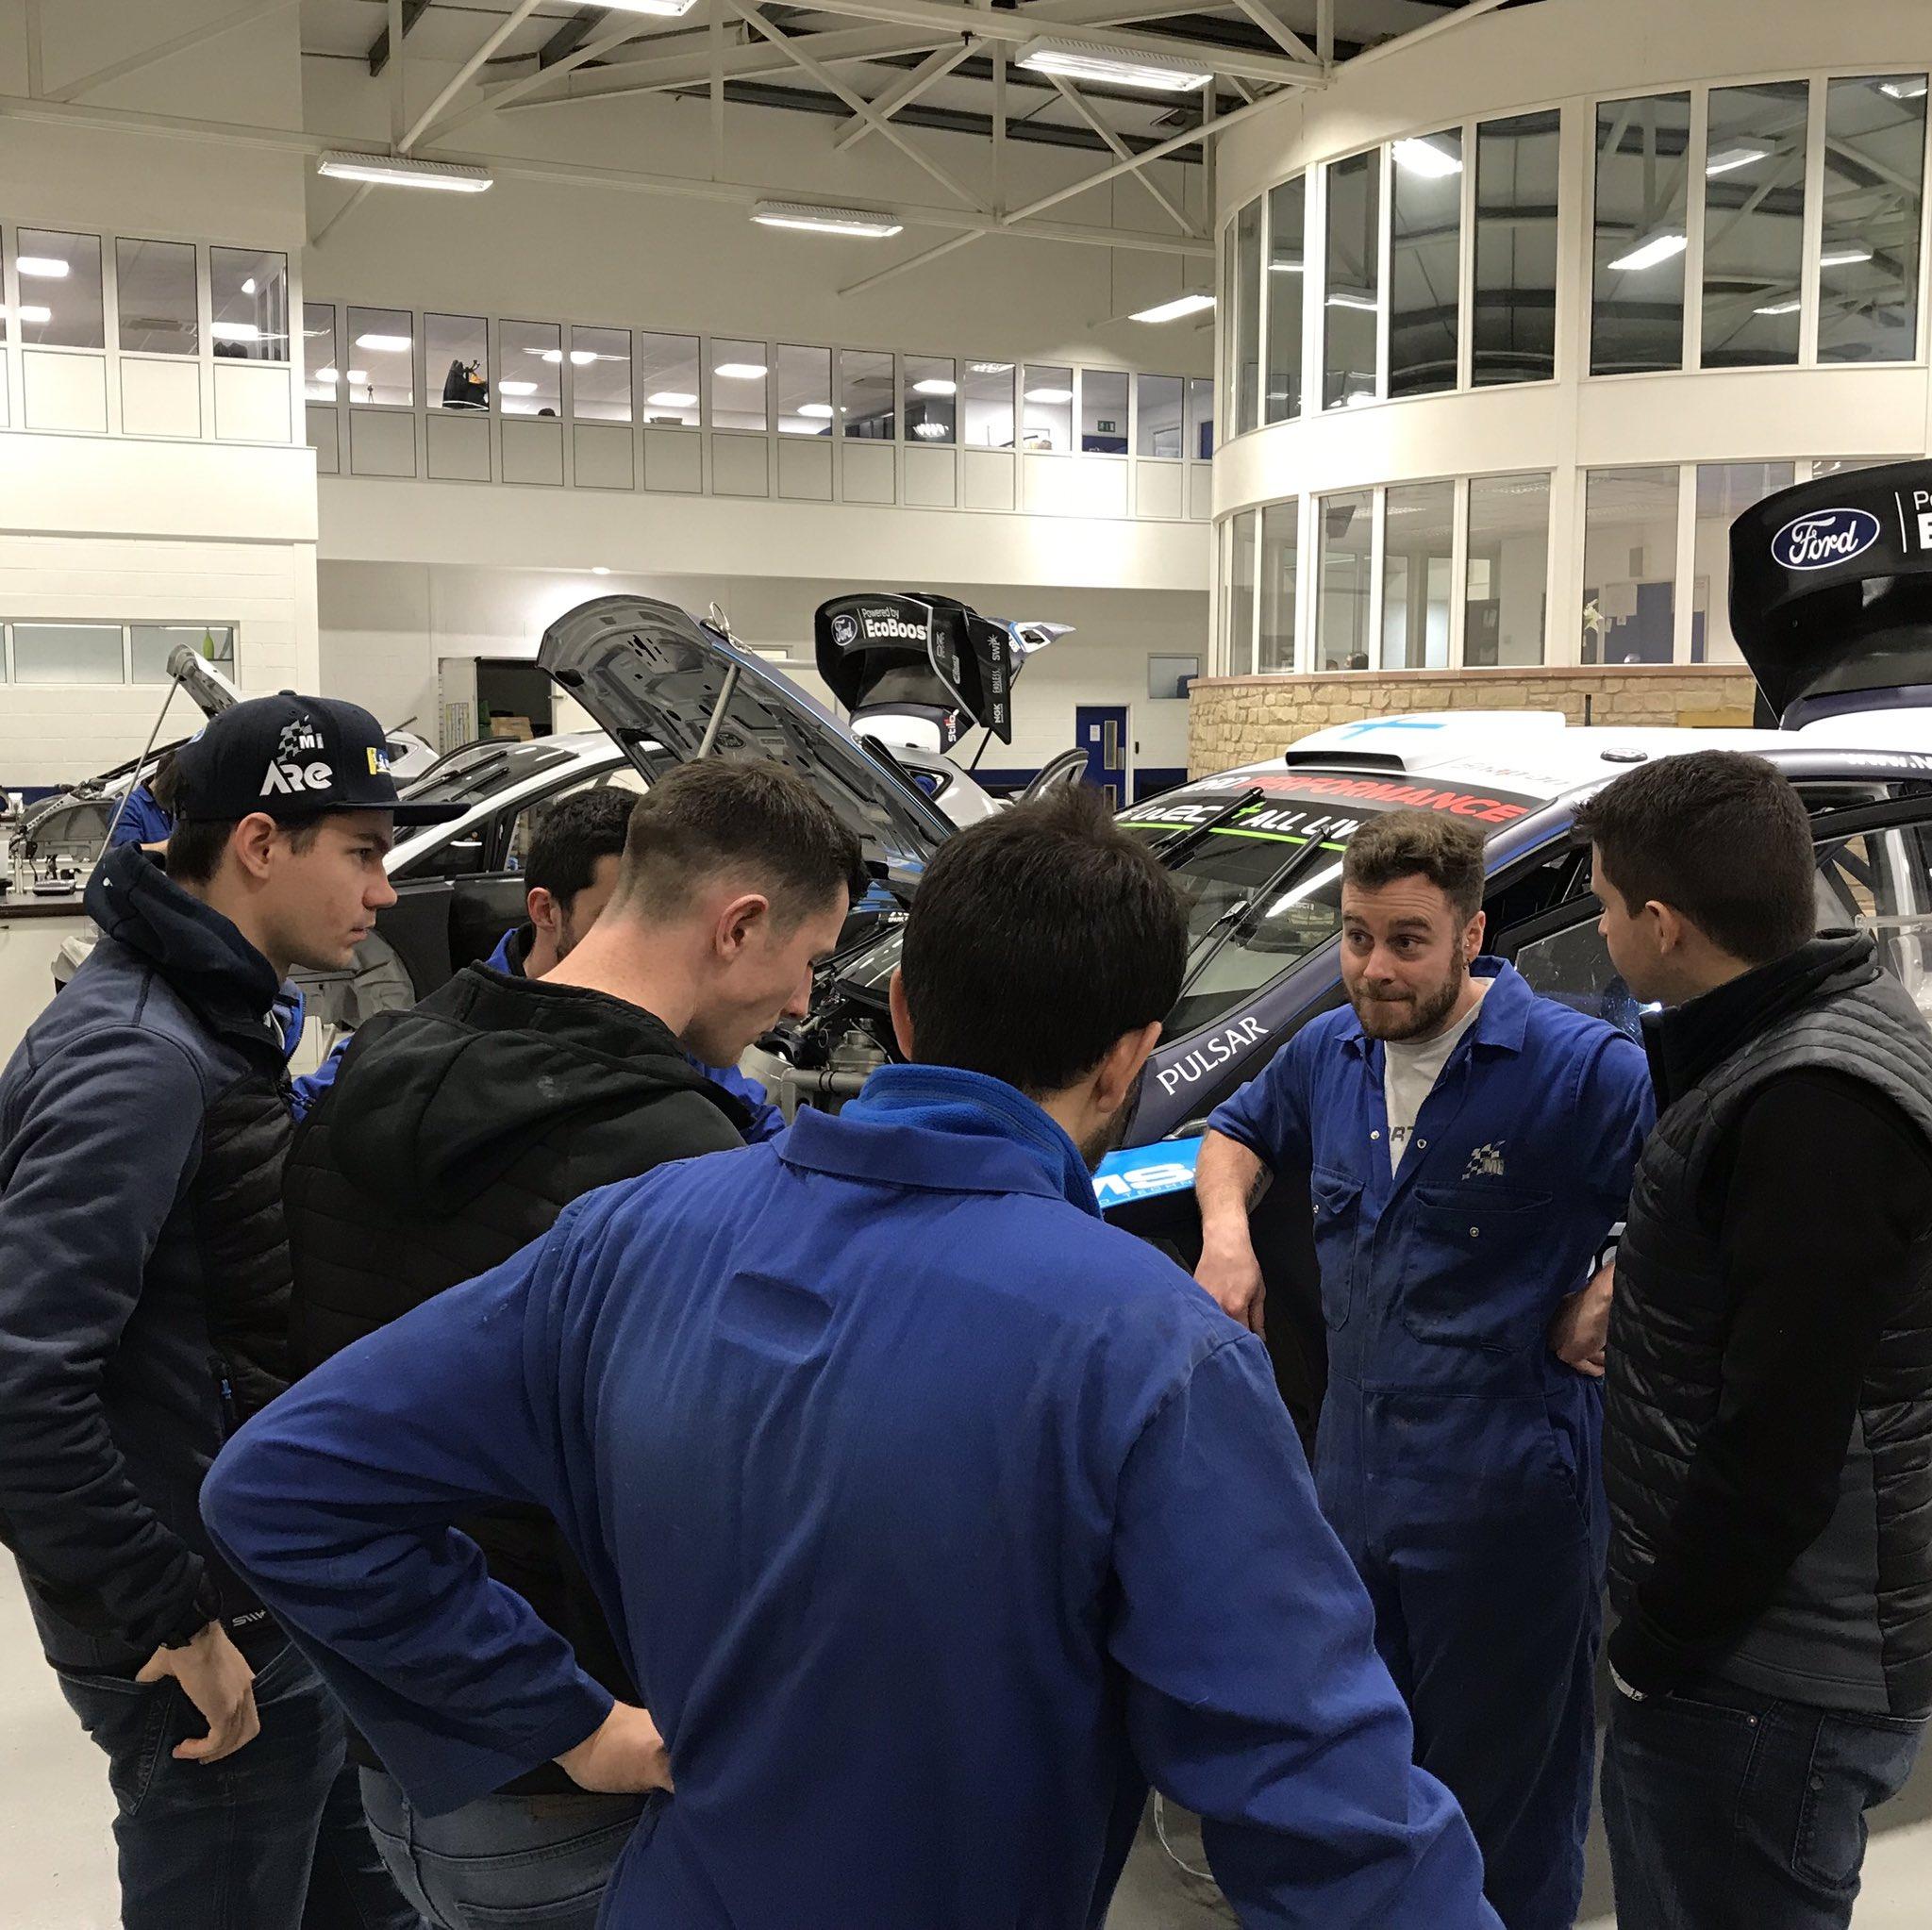 WRC: 87º Rallye Automobile de Monte-Carlo [22-27 de Enero] Dw5dy2qXcAAtMiI